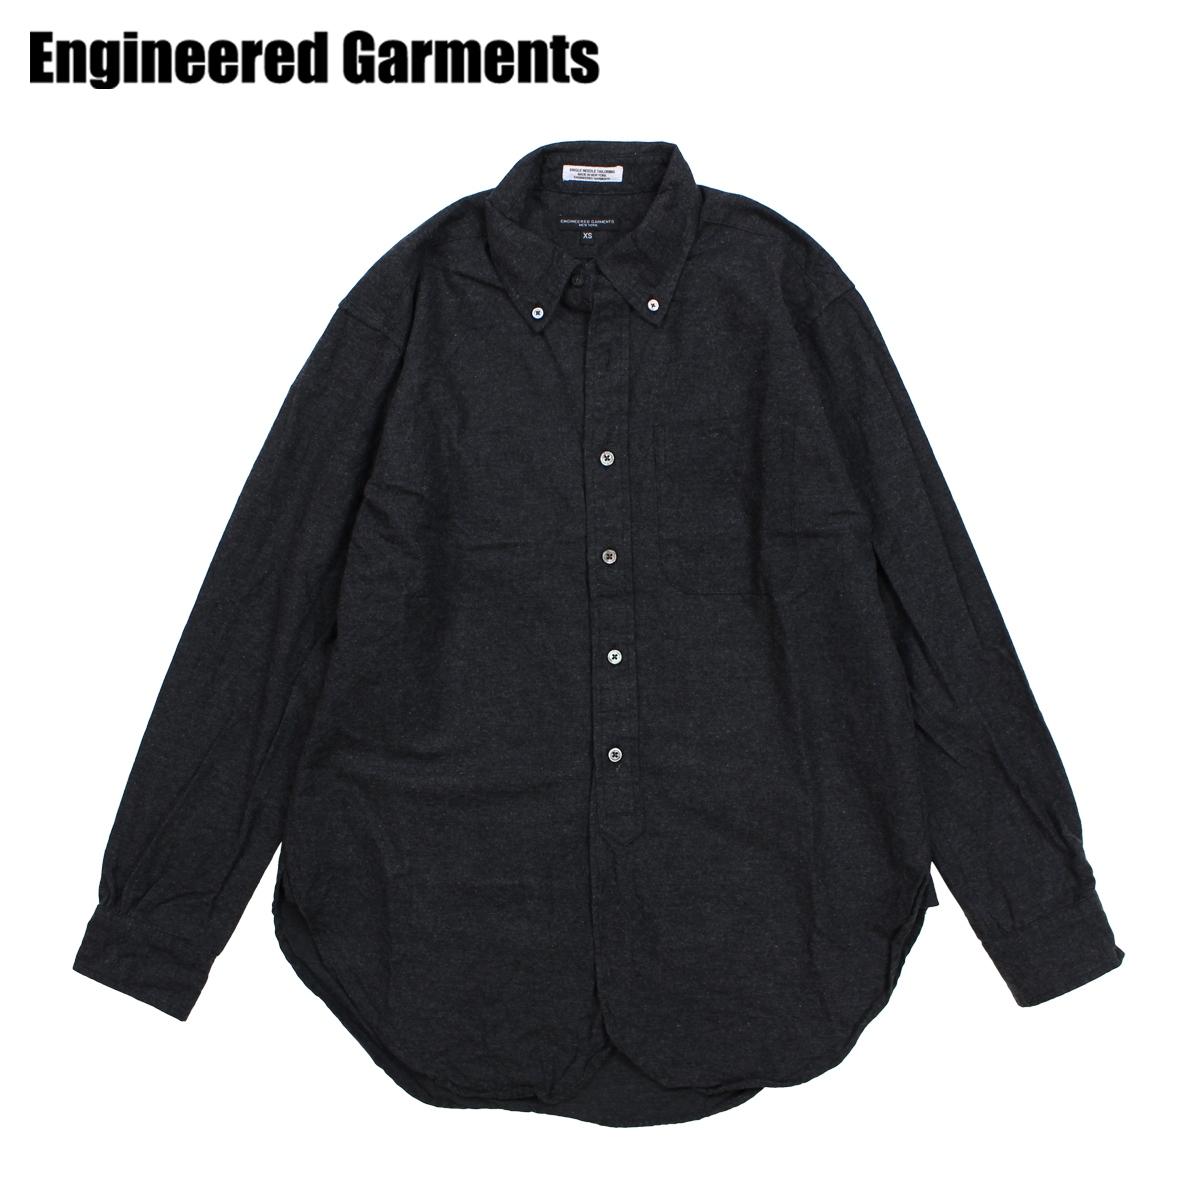 ENGINEERED GARMENTS エンジニアドガーメンツ シャツ メンズ 長袖 オックスフォードシャツ 19 CENTURY BUTTON DOWN SHIRT チャコール F8A0139